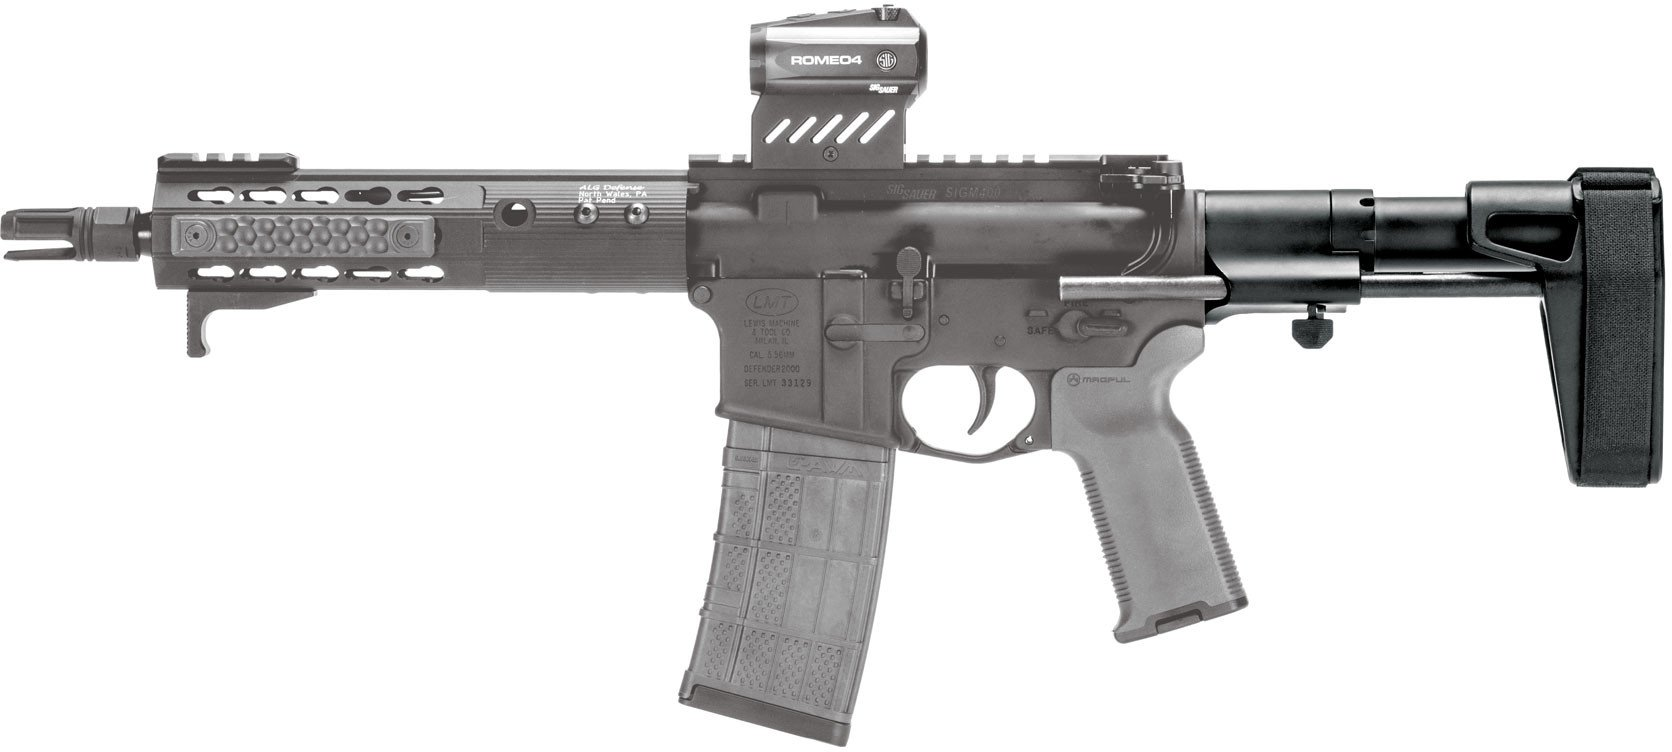 SB Tactical SBPDW Pistol Stabilizing Brace (Options)